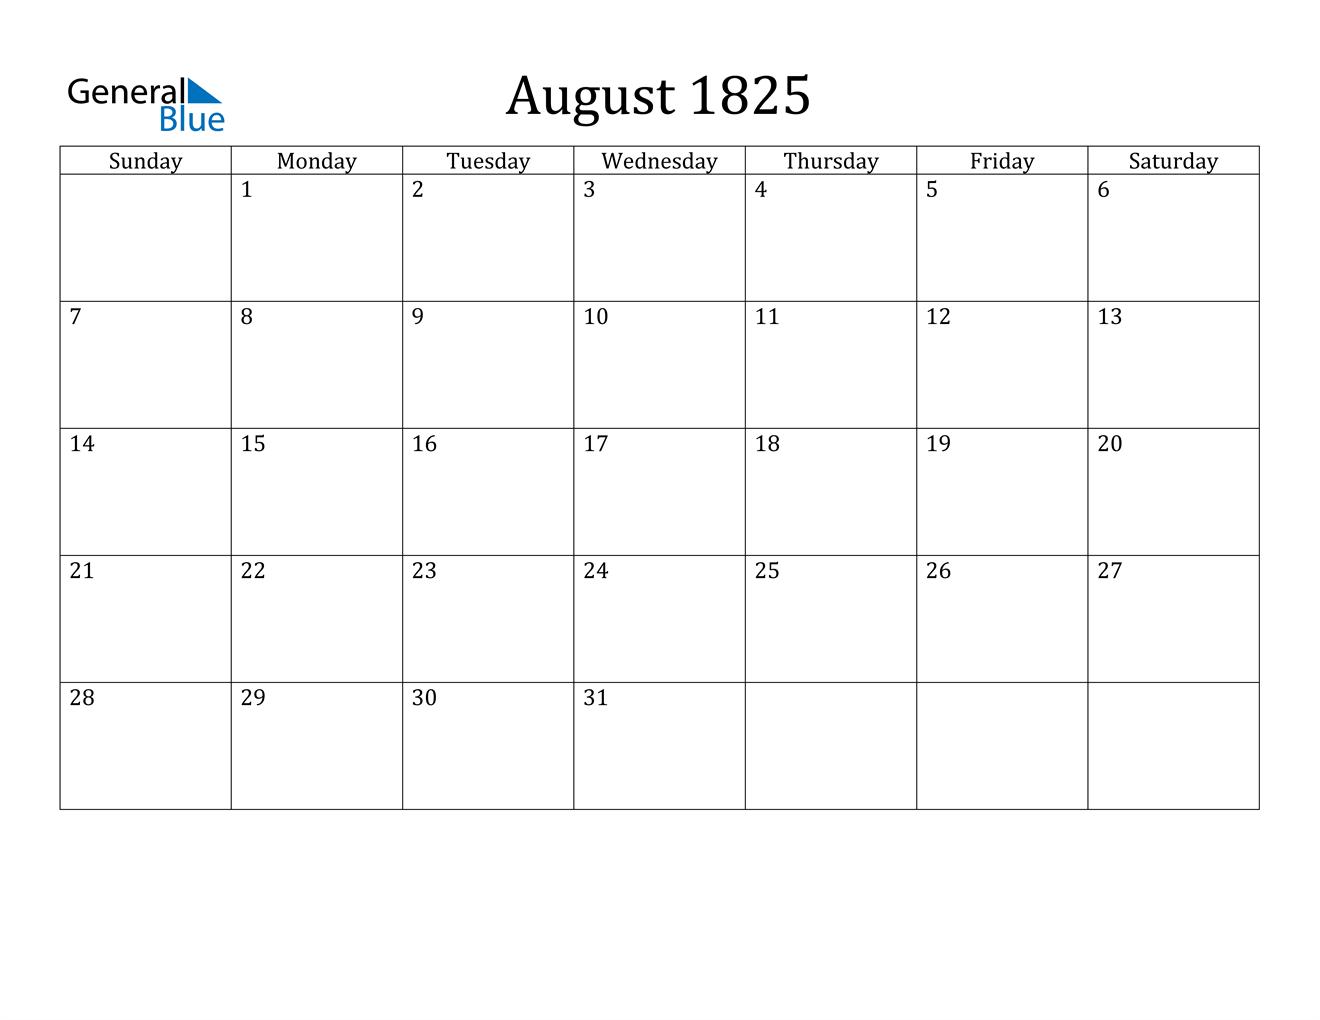 Image of August 1825 Calendar